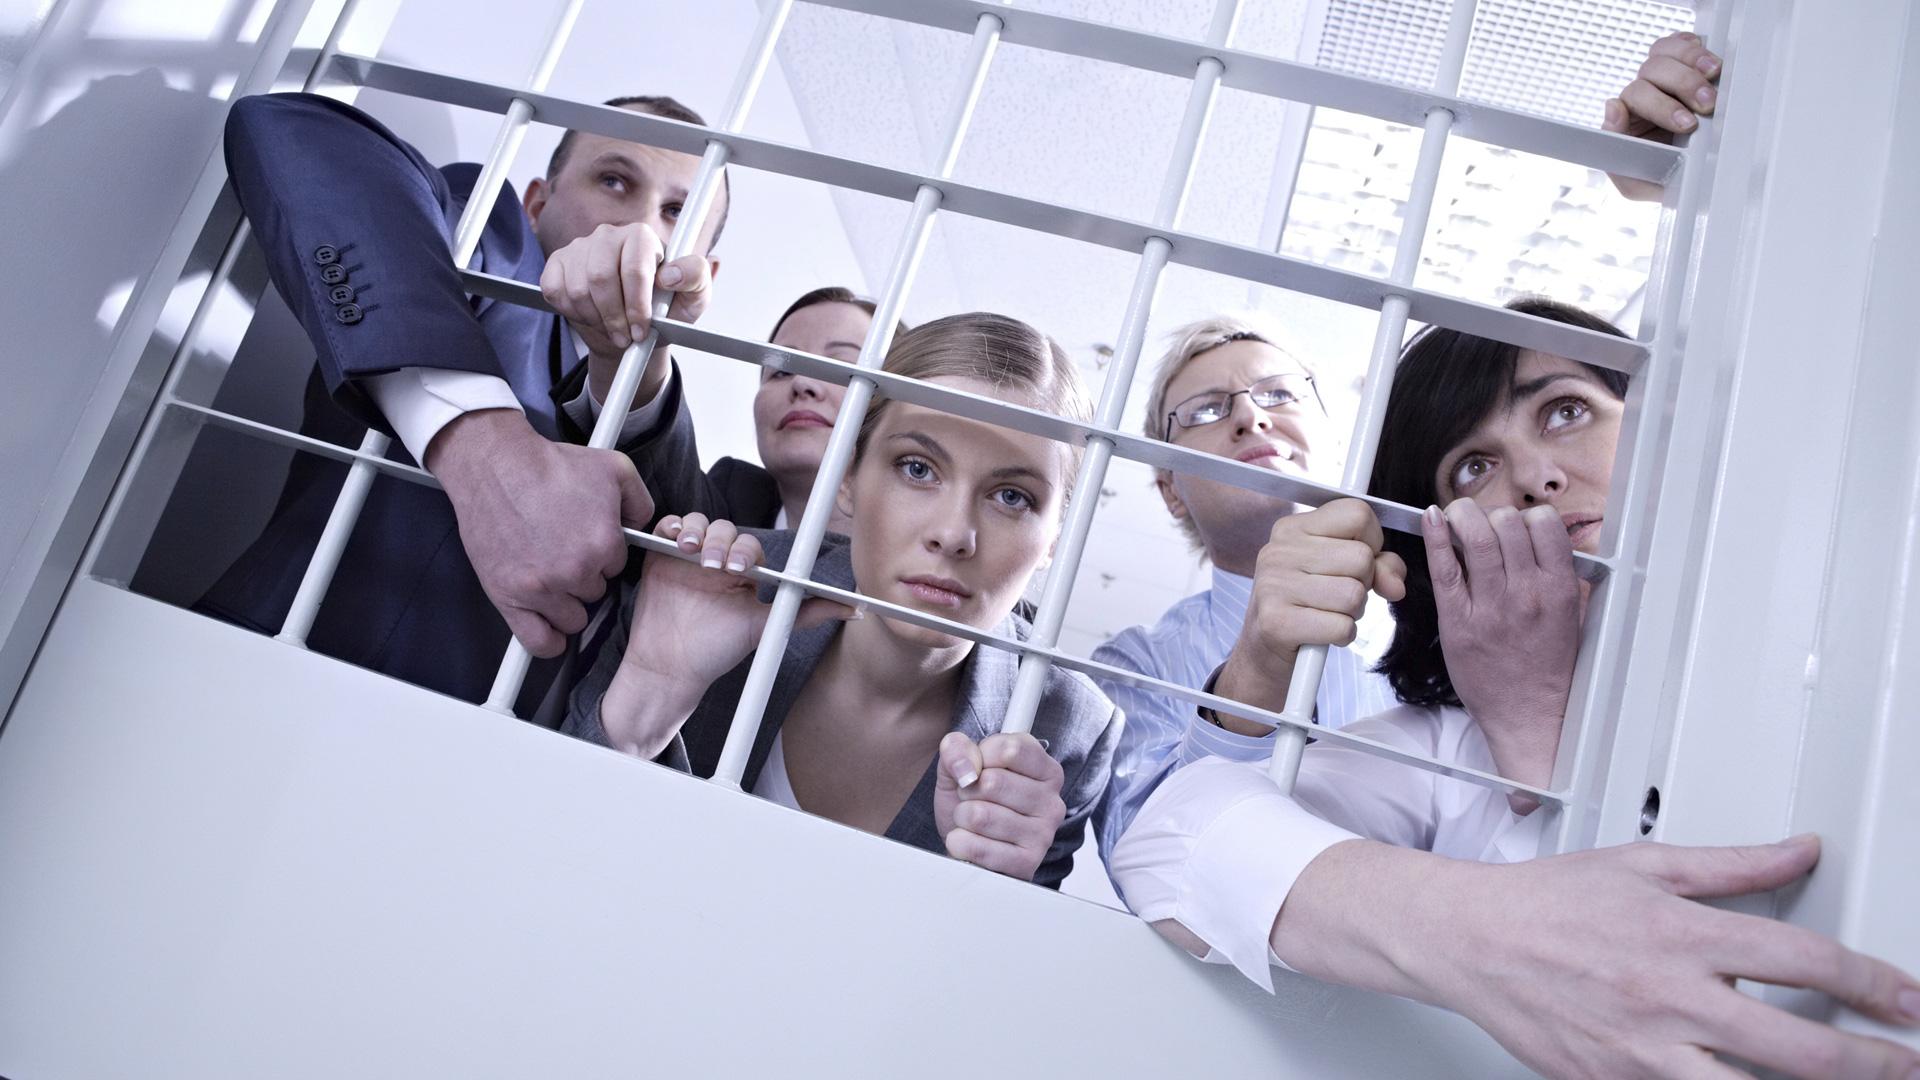 Workplace jail